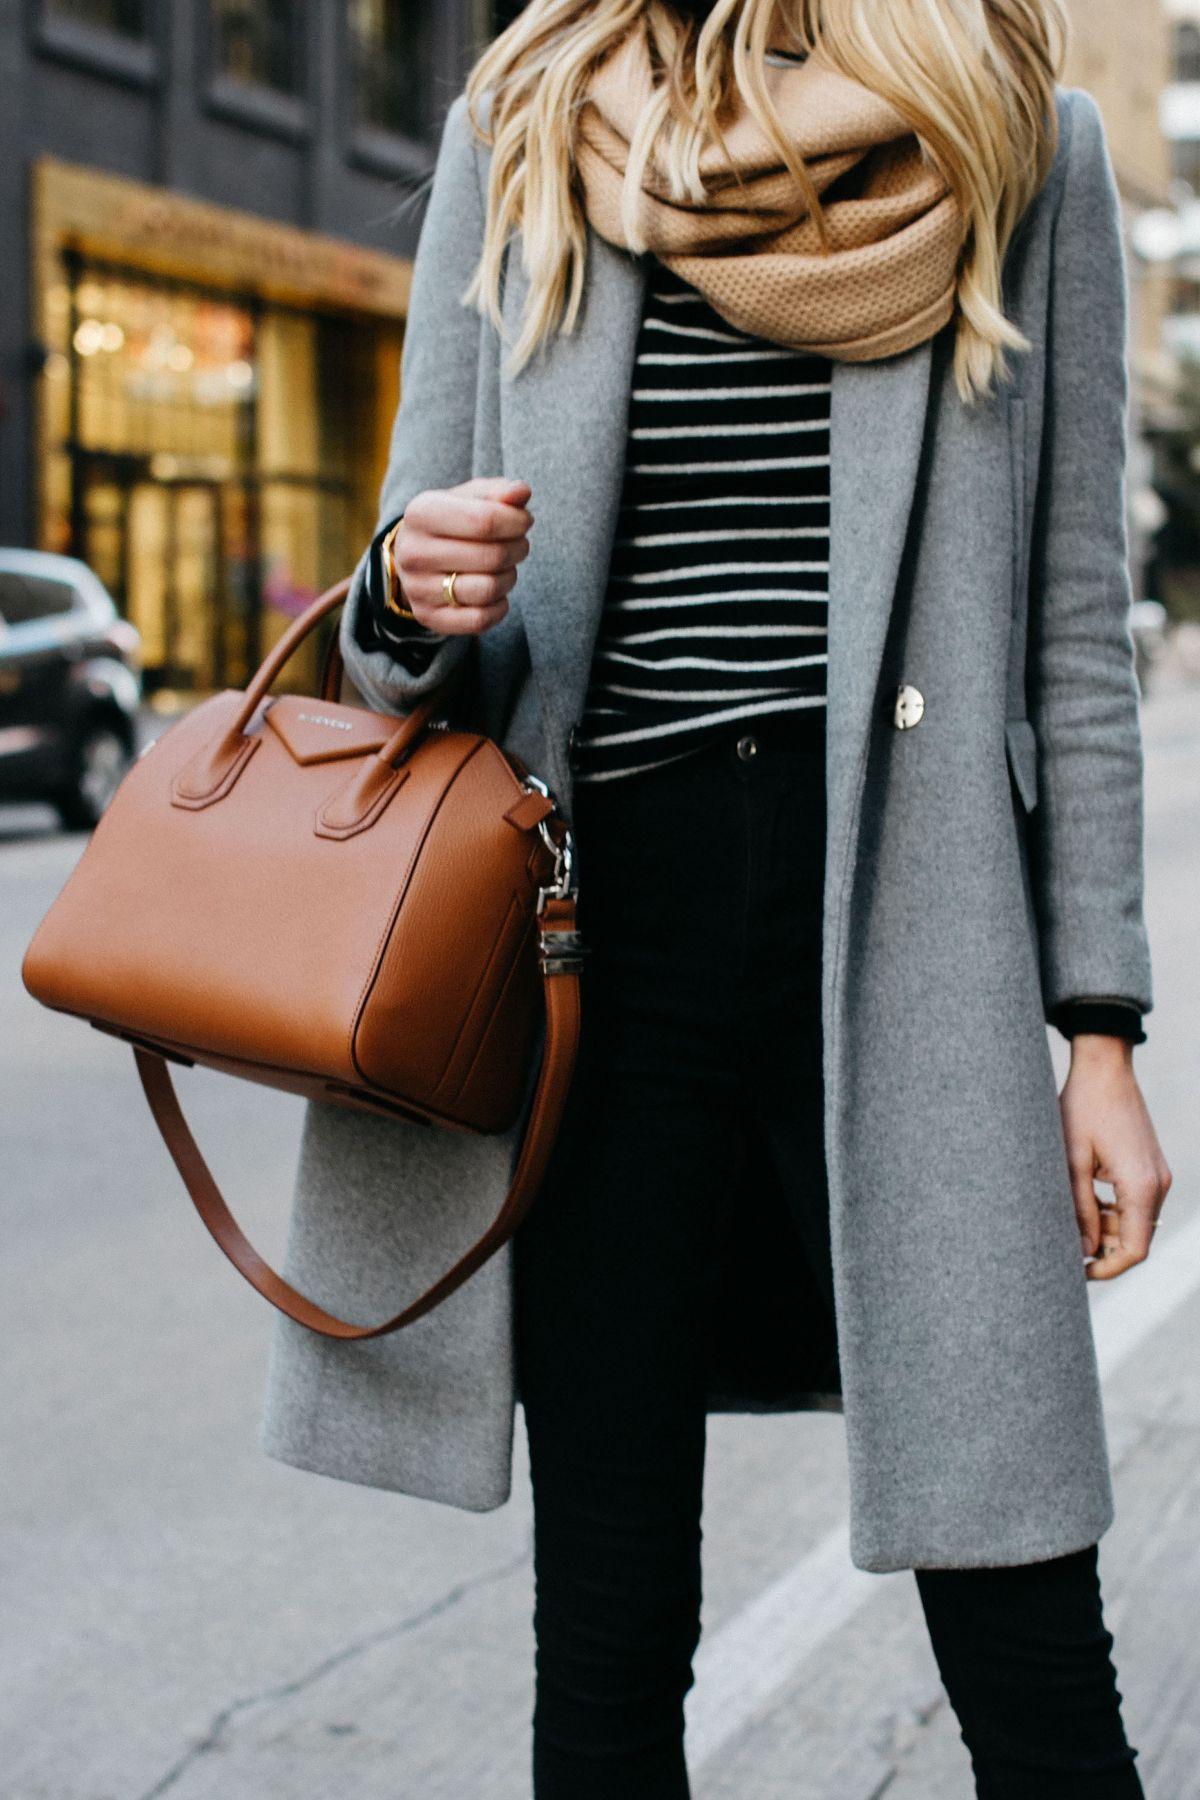 6e7995455ed3 woman wearing zara grey wool coat tan scarf black white striped sweater  black skinny jeans givenchy cognac antigona satchel fashion jackson dallas  blogger ...